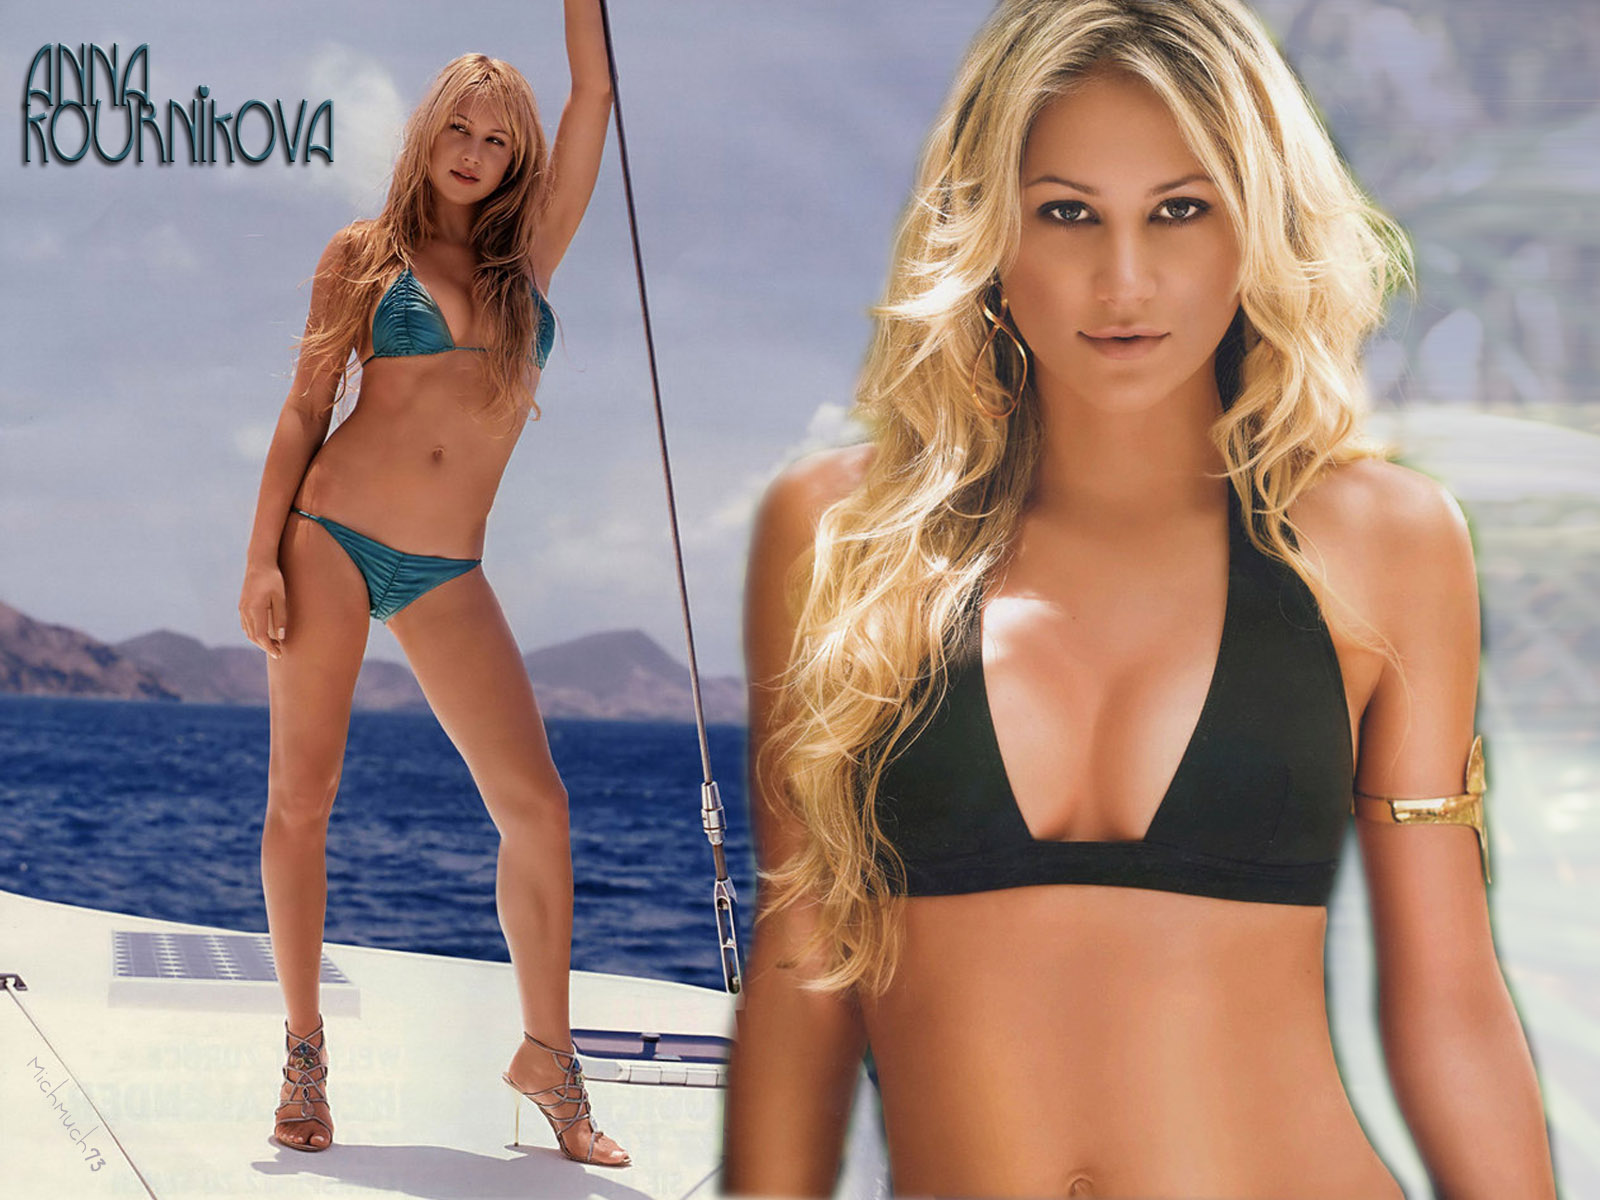 http://1.bp.blogspot.com/-WgGGWgv7vTI/UIUMuCS9EfI/AAAAAAAAAwg/RTUujbFwdMQ/s1600/Anna_Kournikova+Sexy+Tennis+Player+(6).jpg